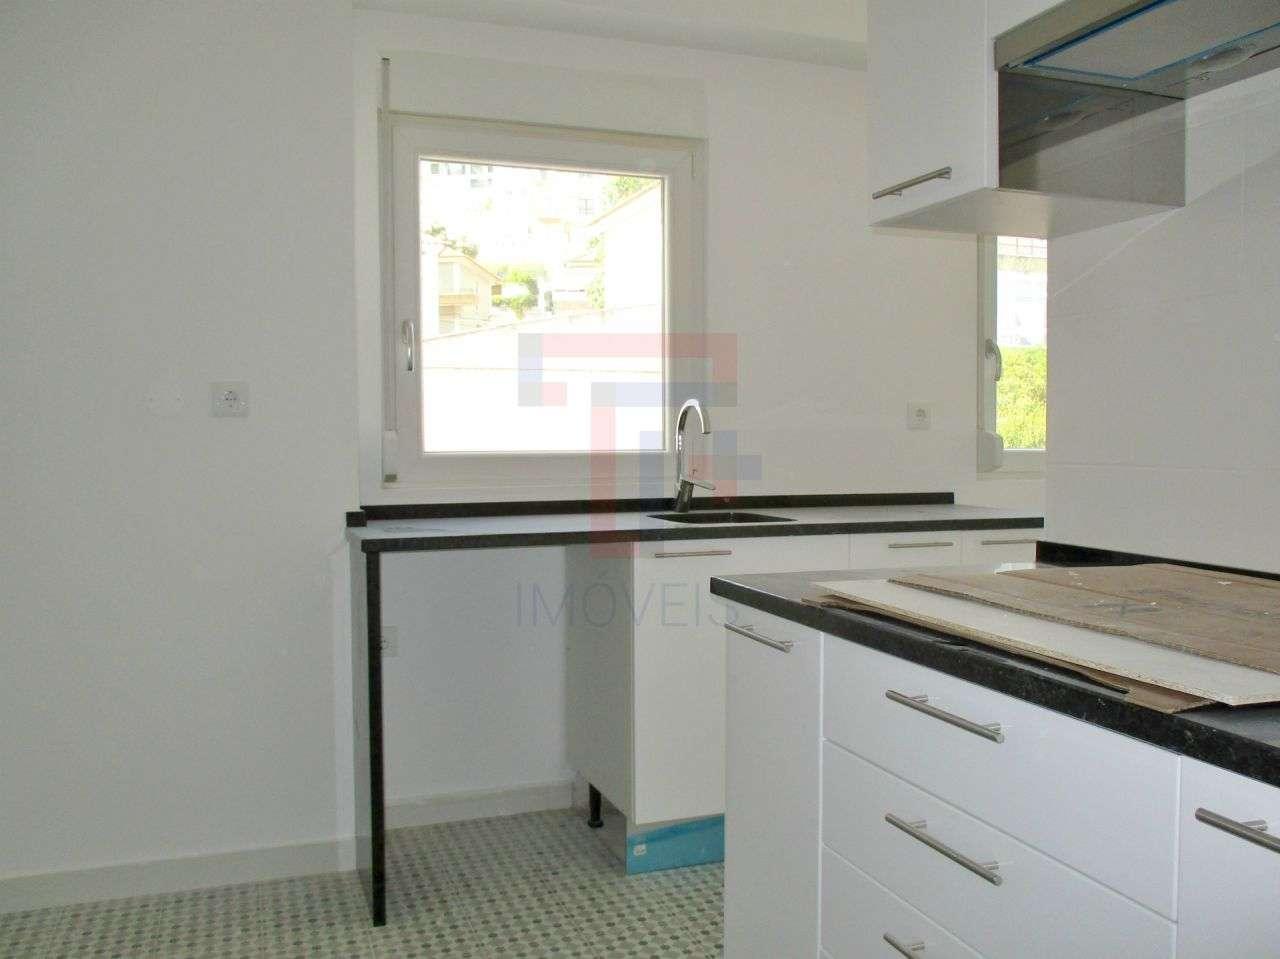 Apartamento para comprar, Mina de Água, Amadora, Lisboa - Foto 3